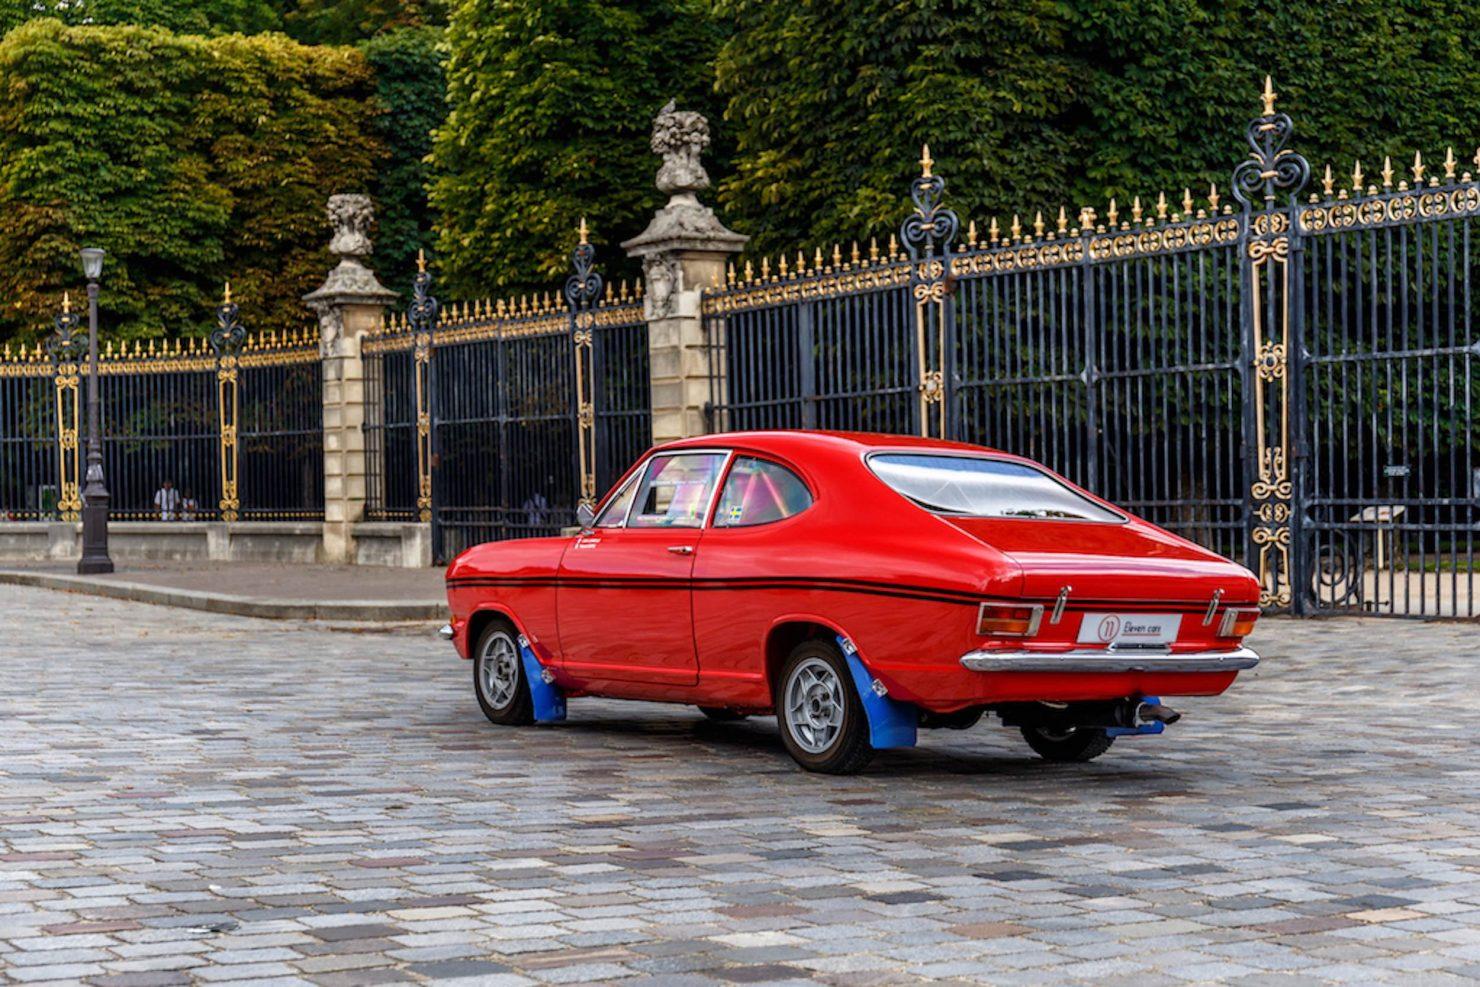 opel kadett rallye car 1 1480x987 - 1969 Opel Rallye Kadett